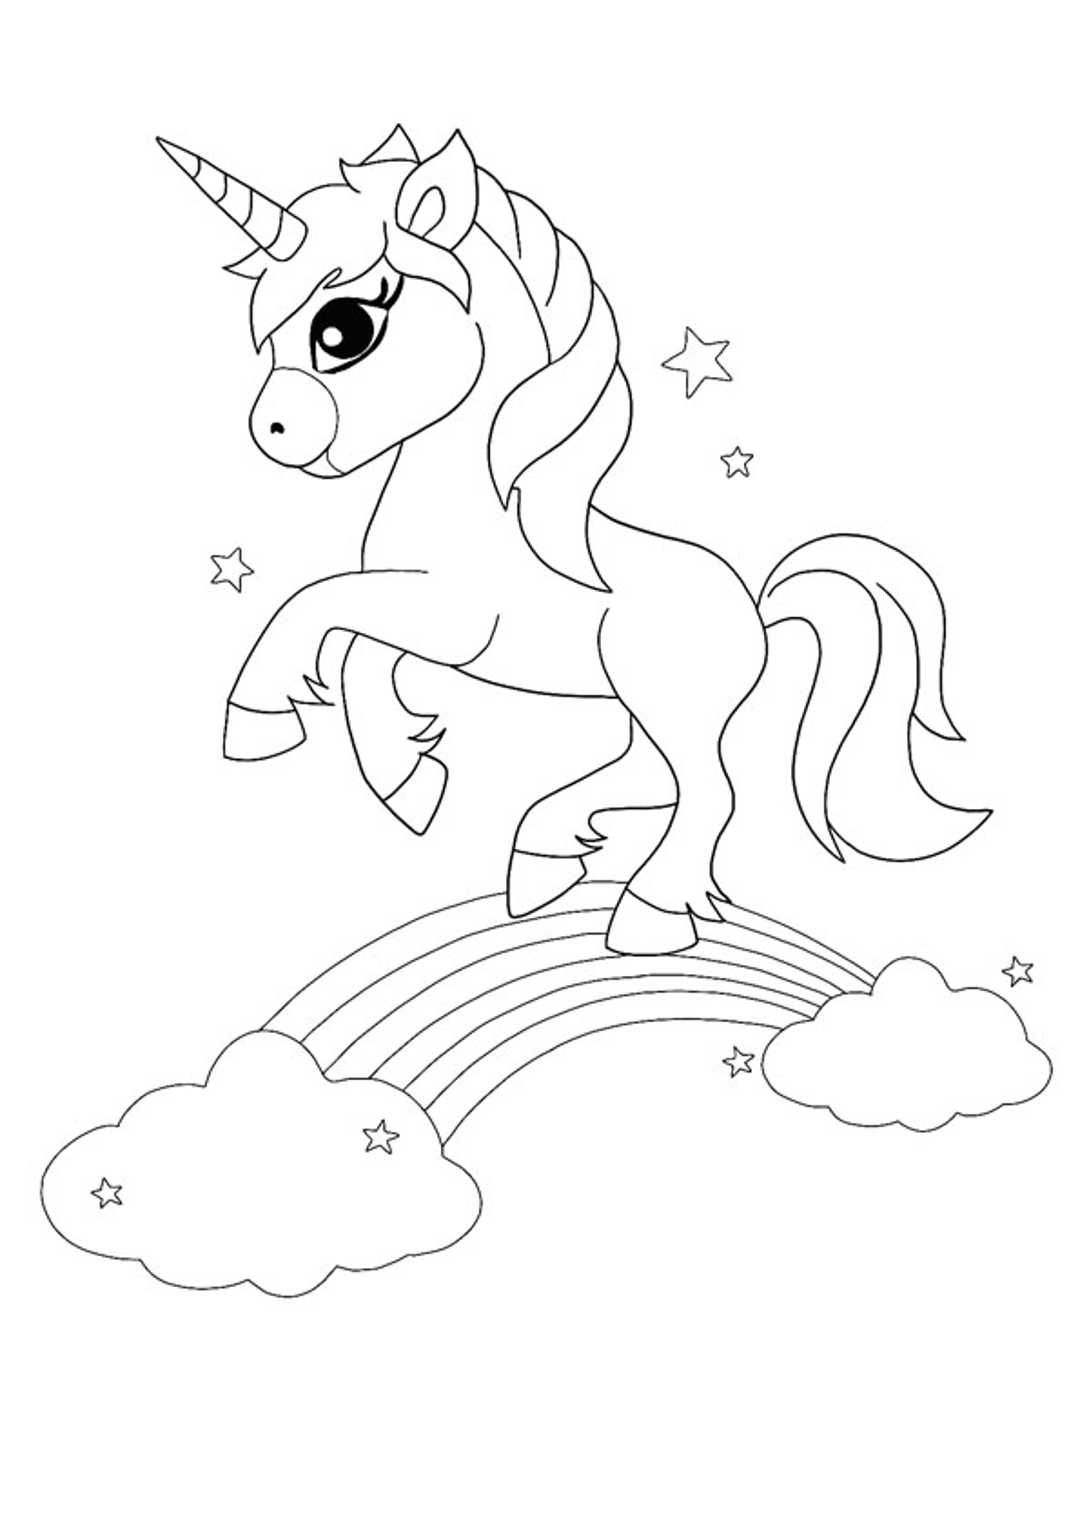 25+ Rainbow princess unicorn coloring pages ideas